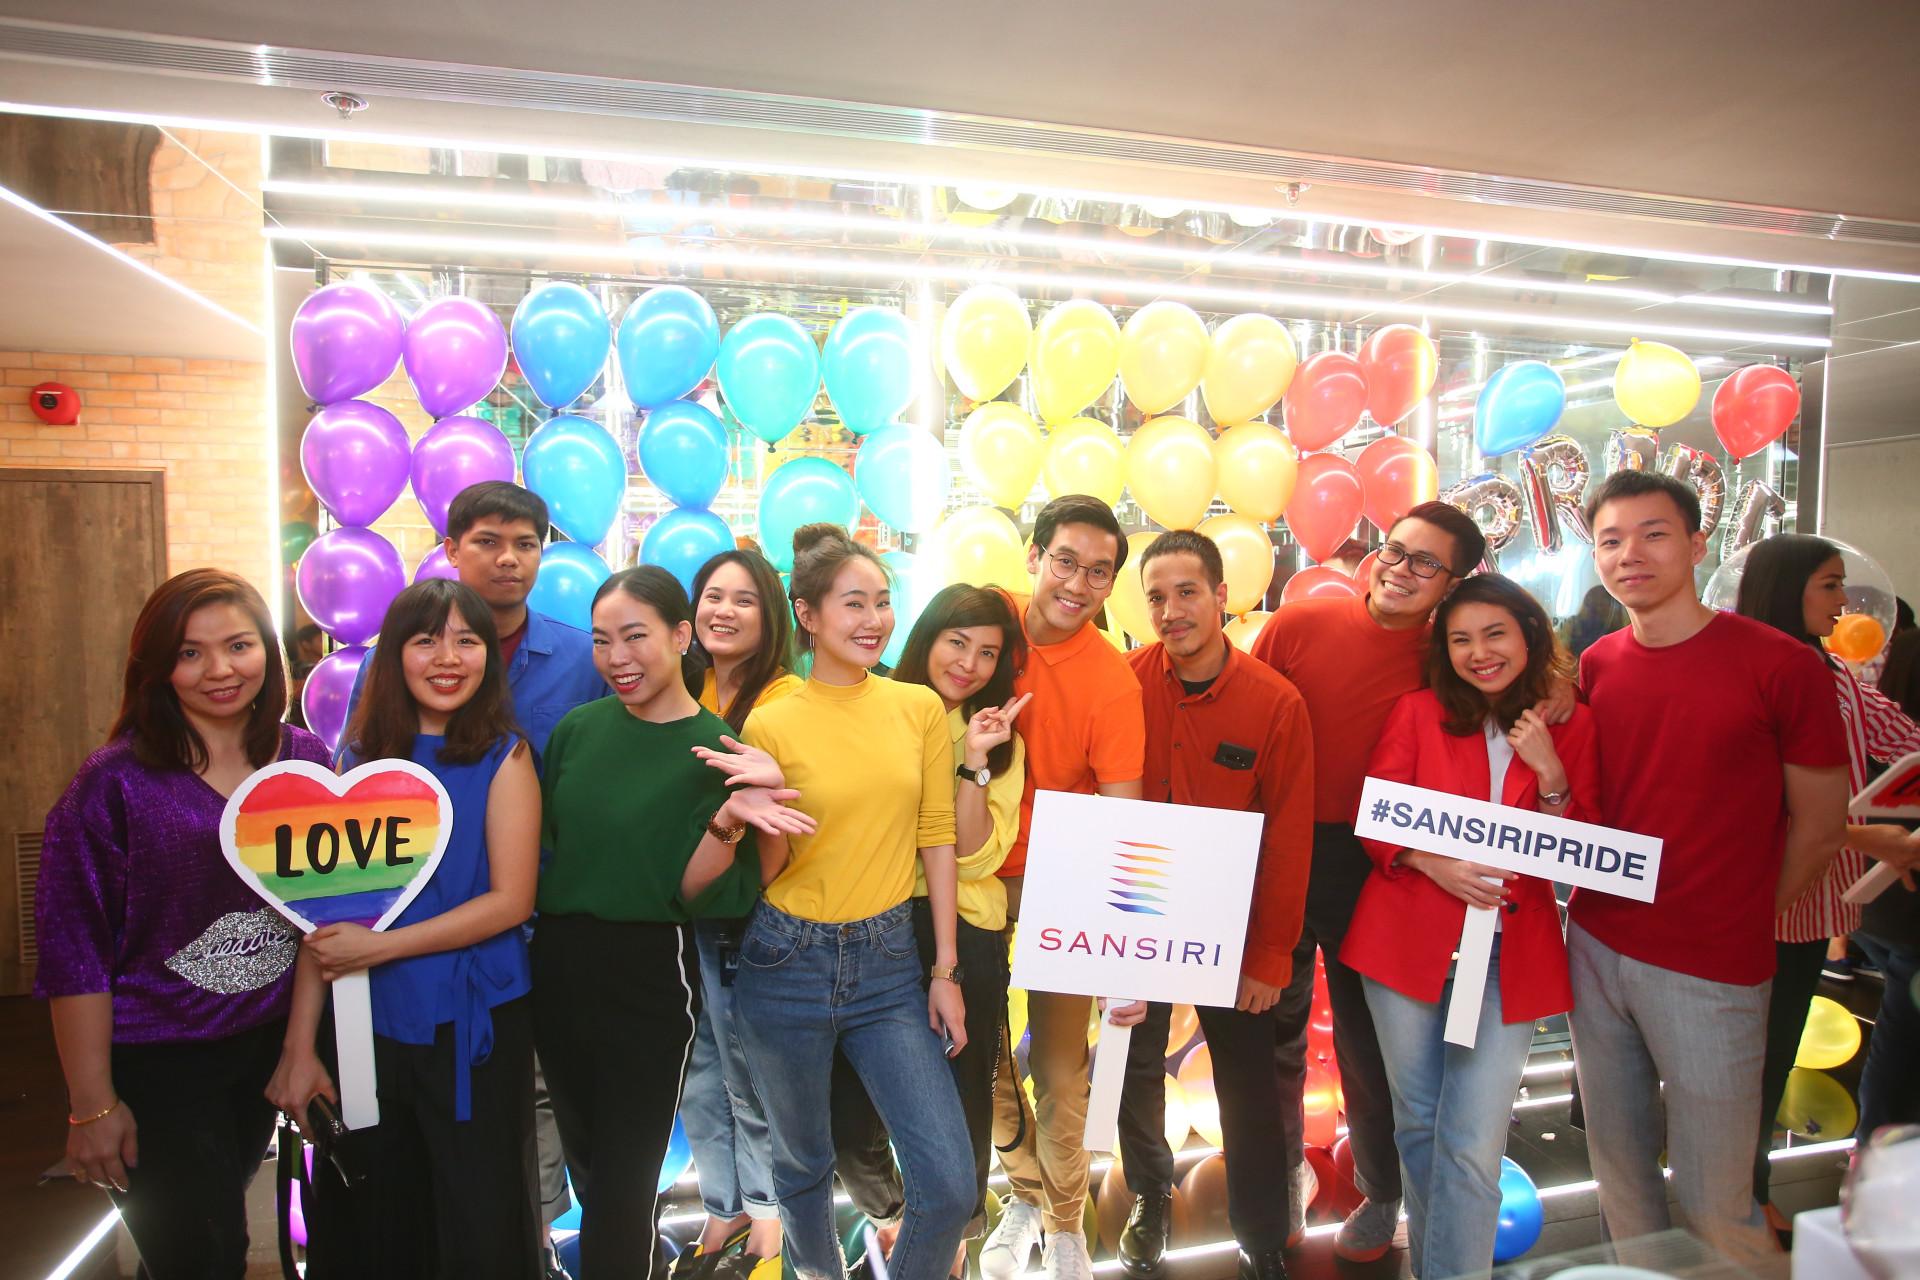 Sansiri Pride Month 2018